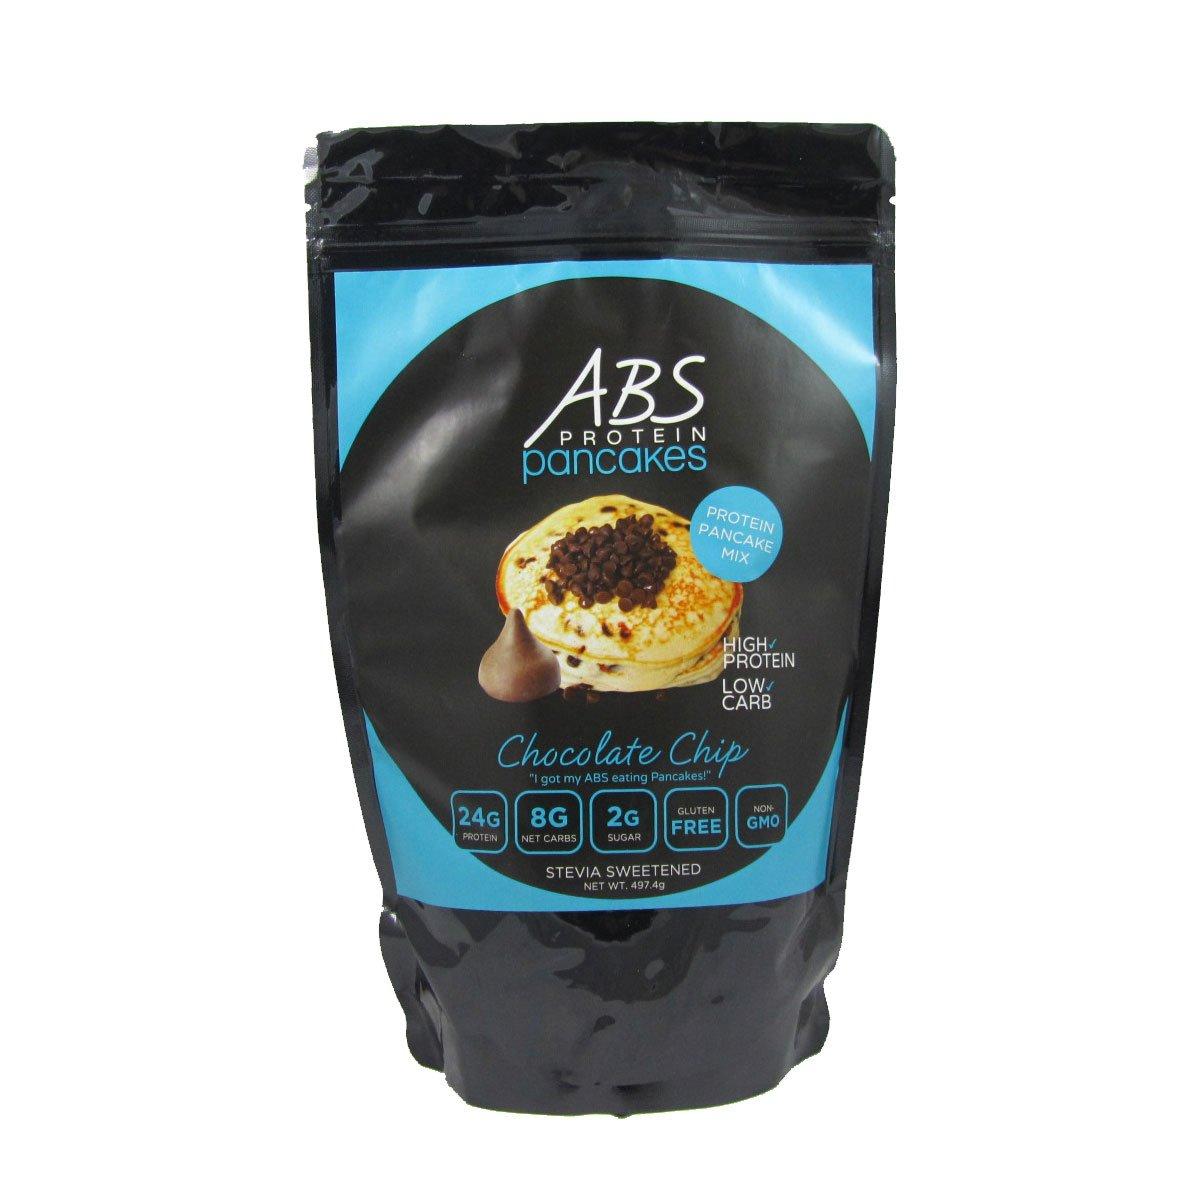 ABS Protein Pancakes - Chocolate Chip Pancake and Waffle Mix - 26g Protein Pancake Gluten Free - High Protein Low Carb - 1 lb. Package by ABS Protein Pancakes